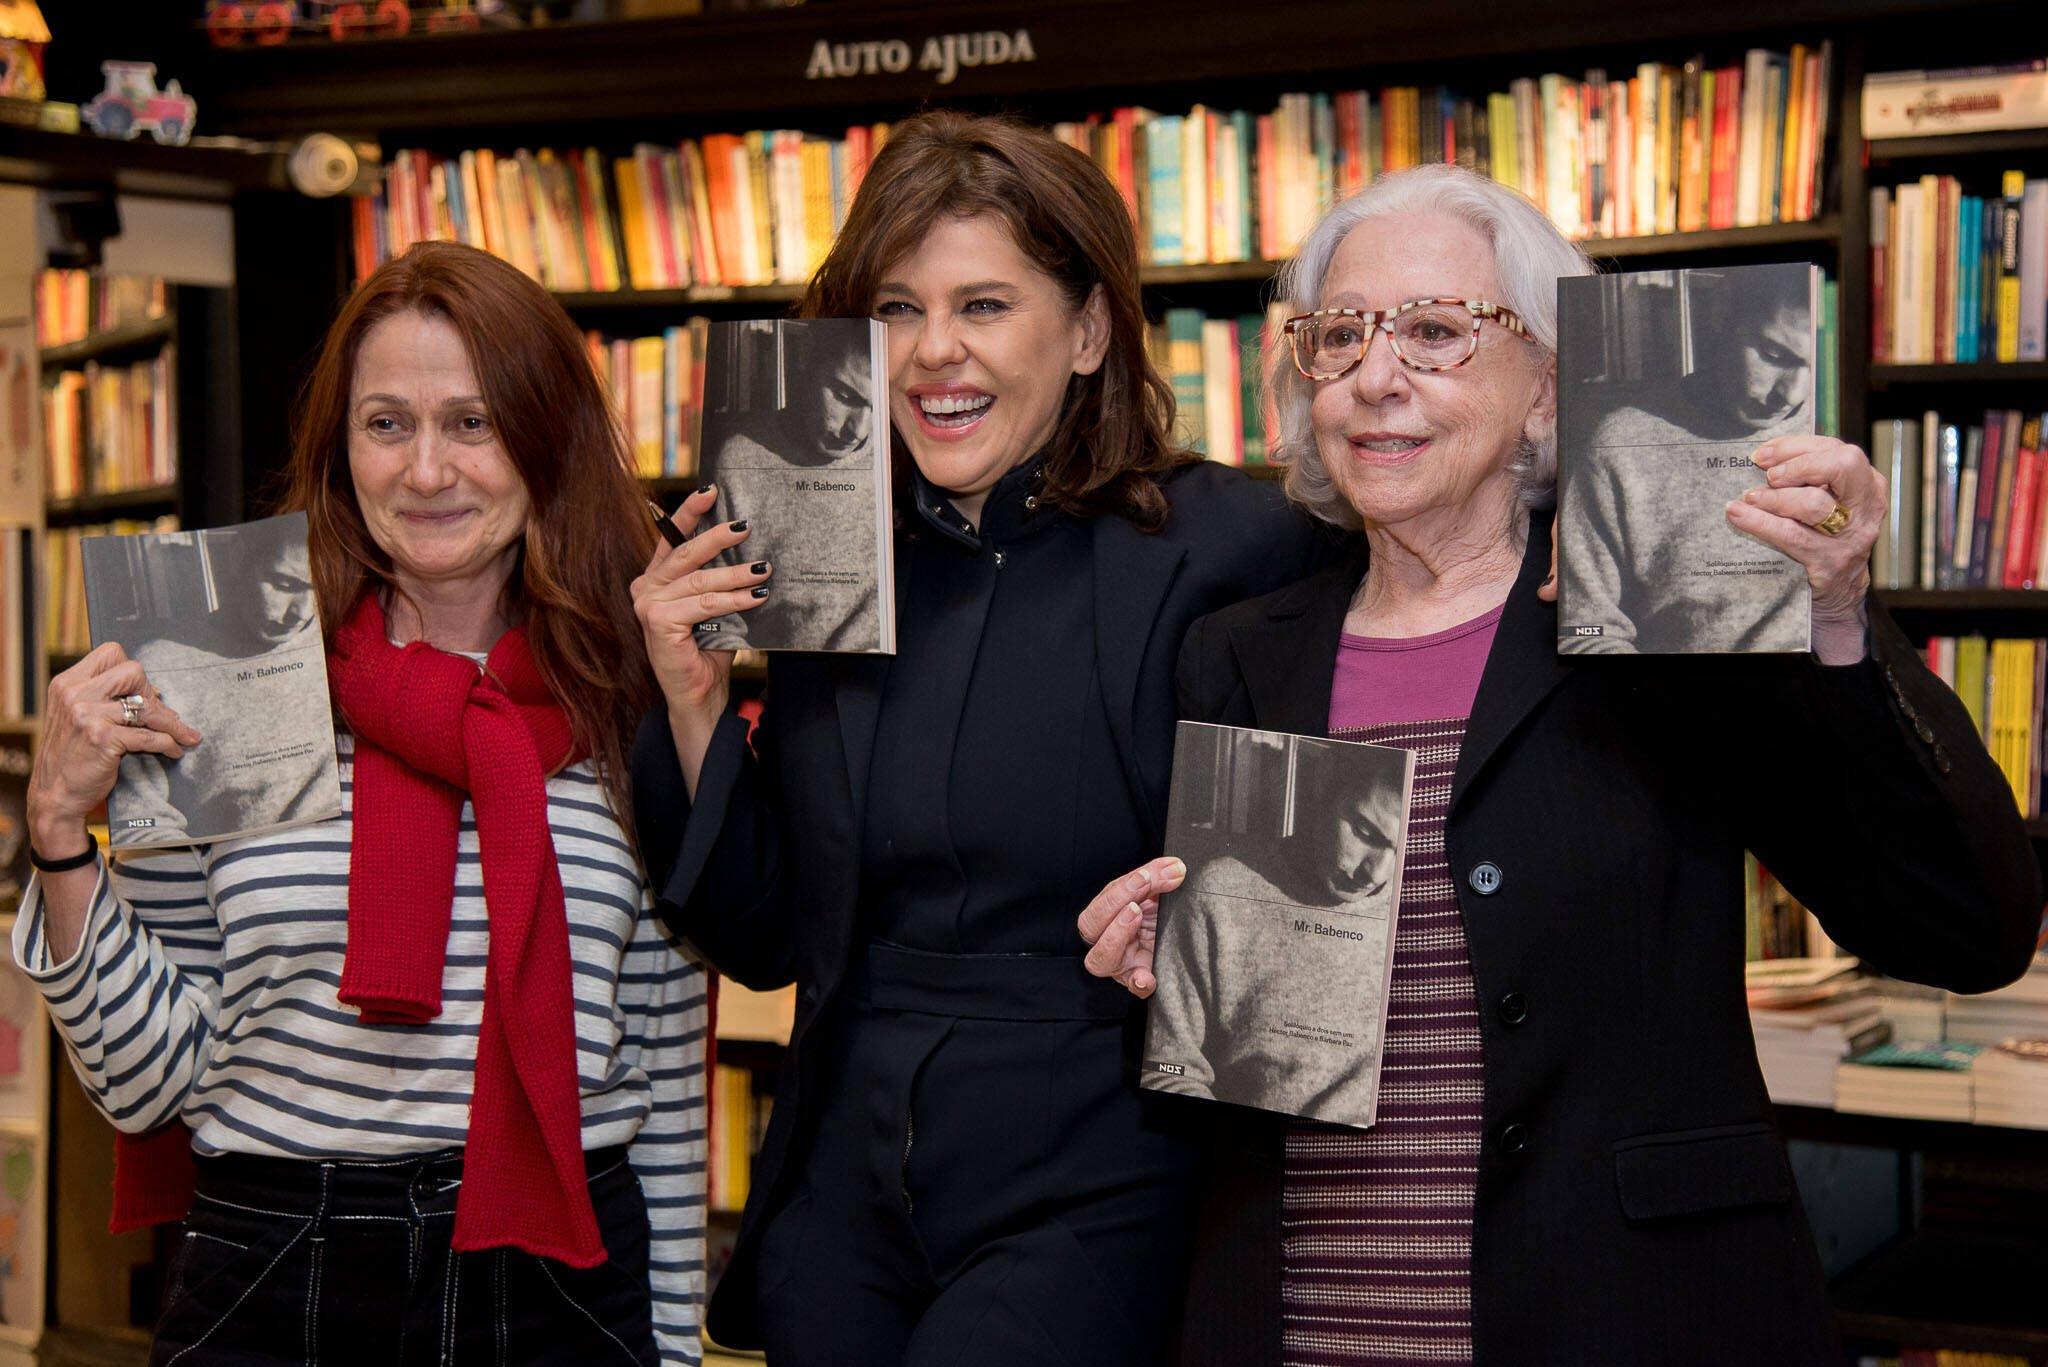 Zezé Polessa, Bárbara Paz e Fernanda Montenegro/ Foto: Ana Paula Amorim